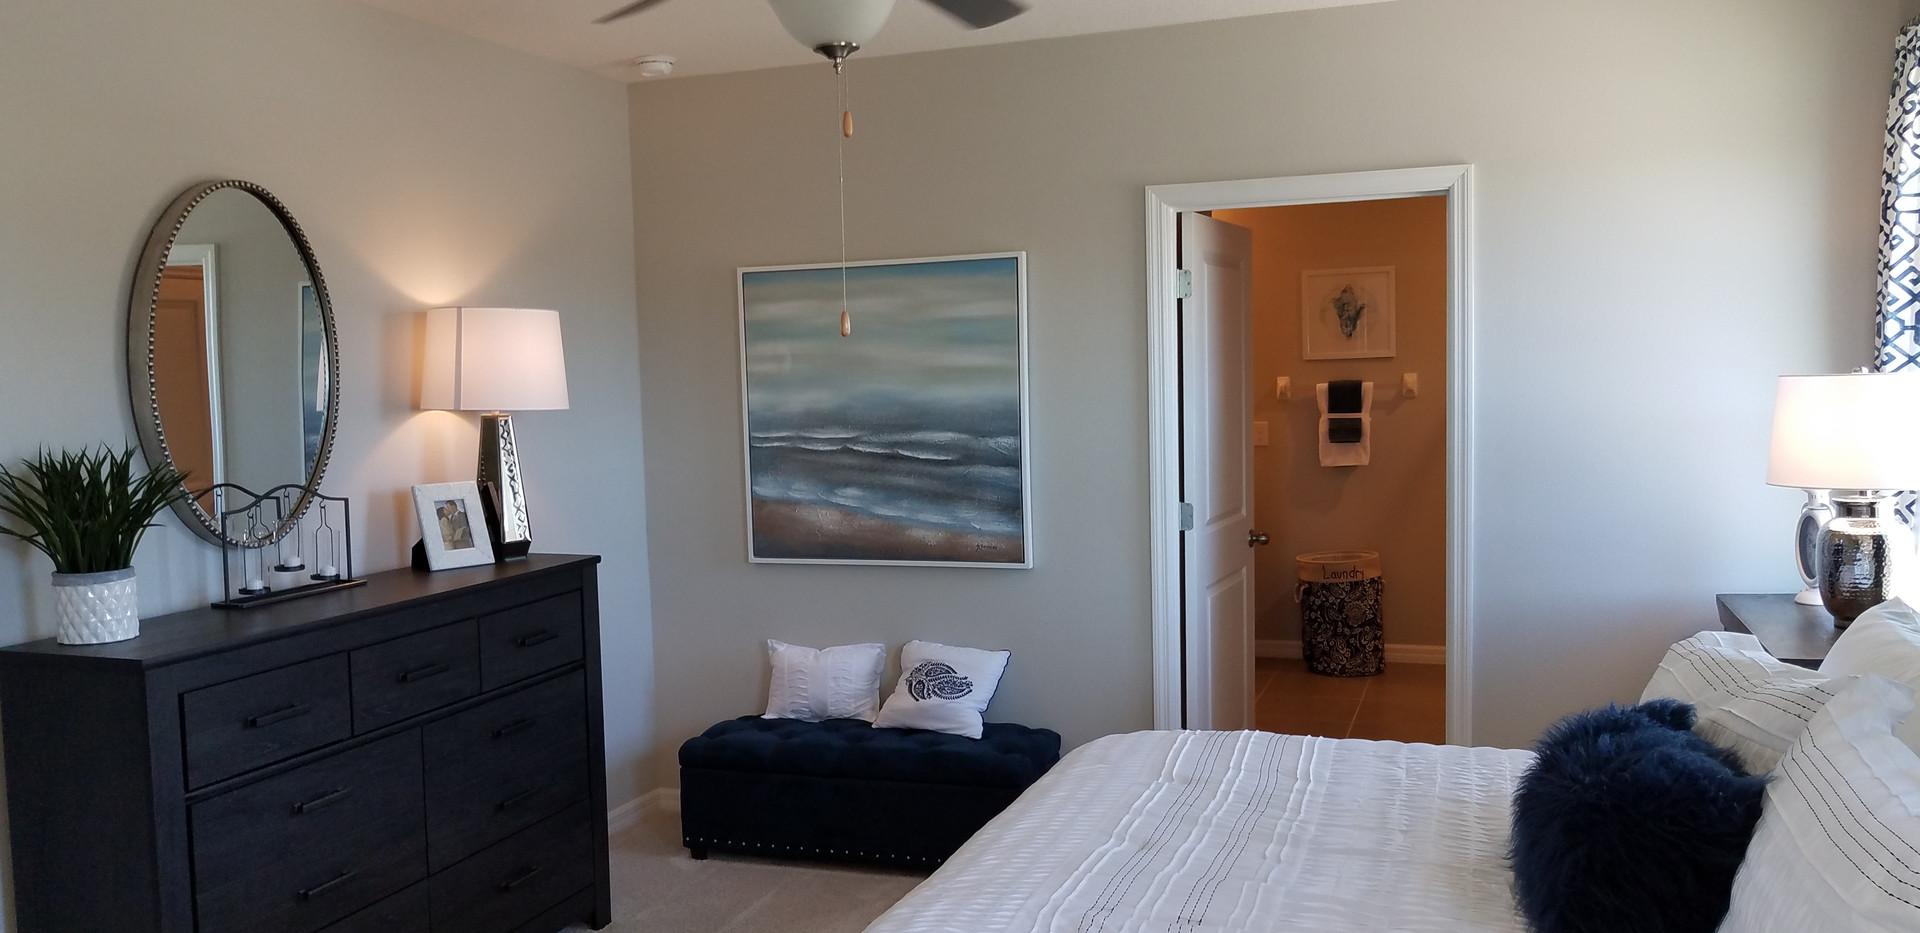 Ashton Meadows New Homes for Sale master bedroom